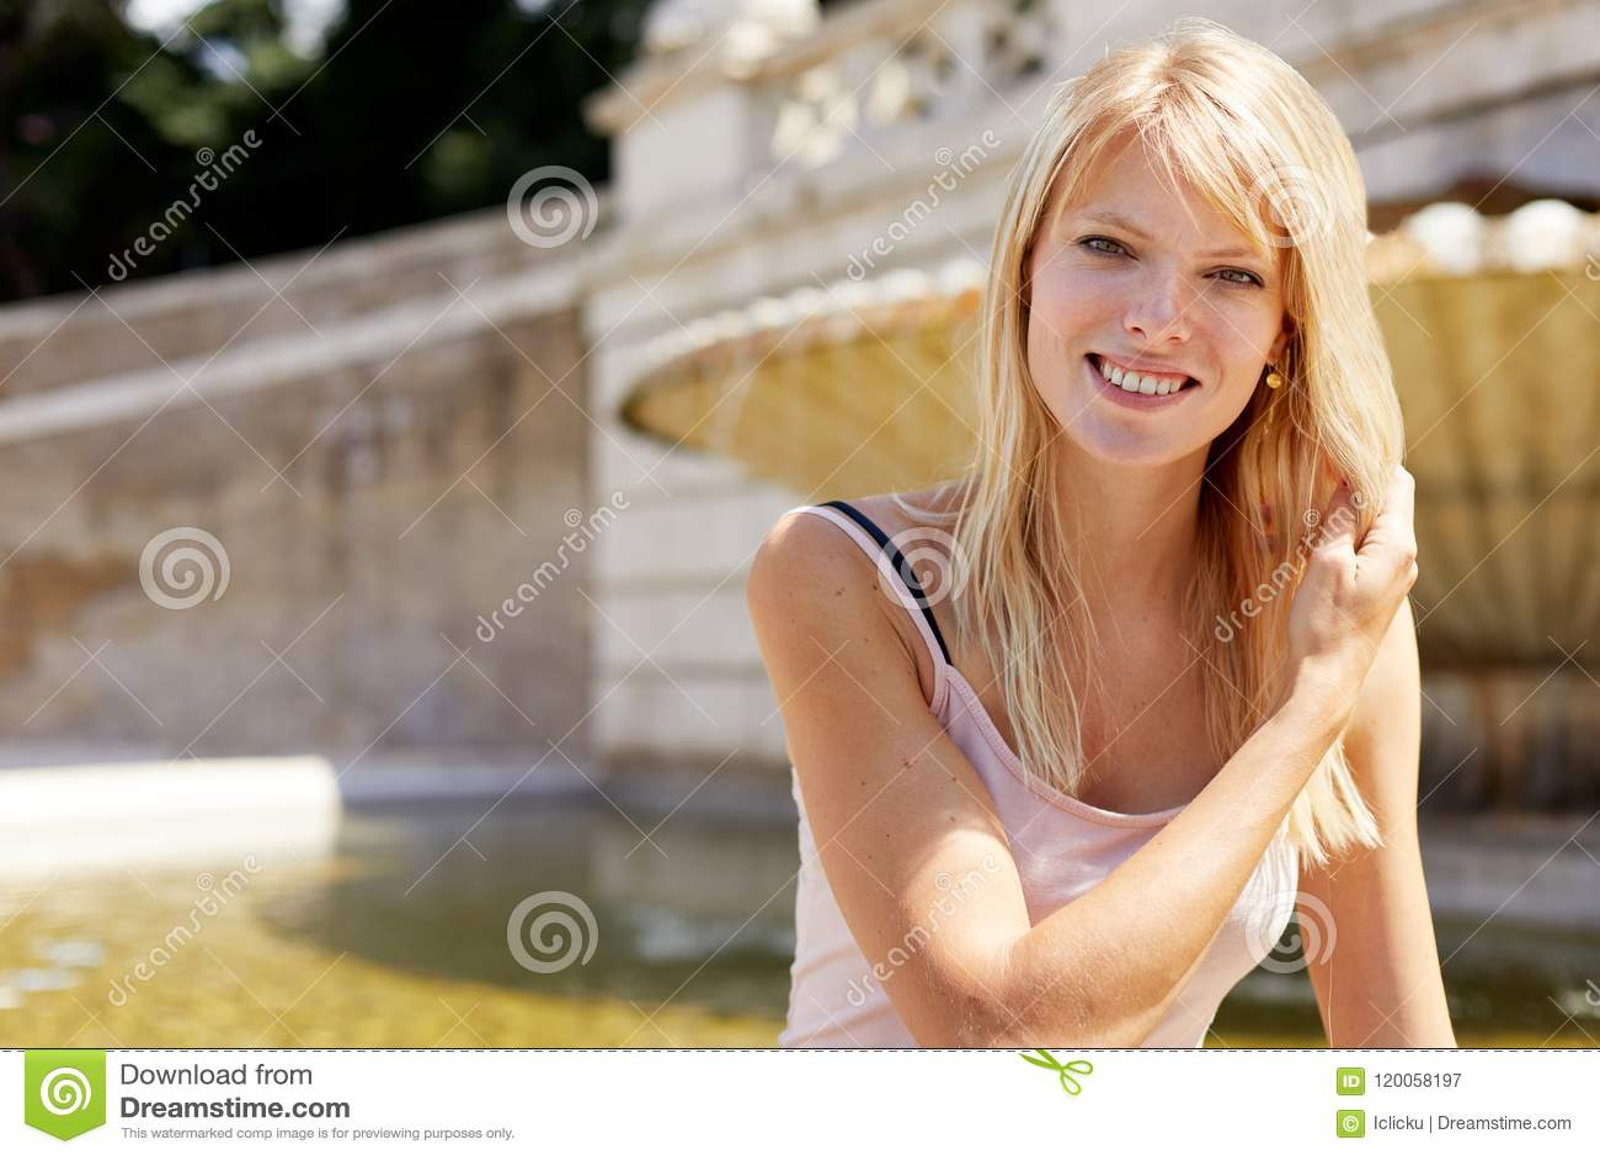 Glimlachende vrouwen buiten gezet in piazza del popolo